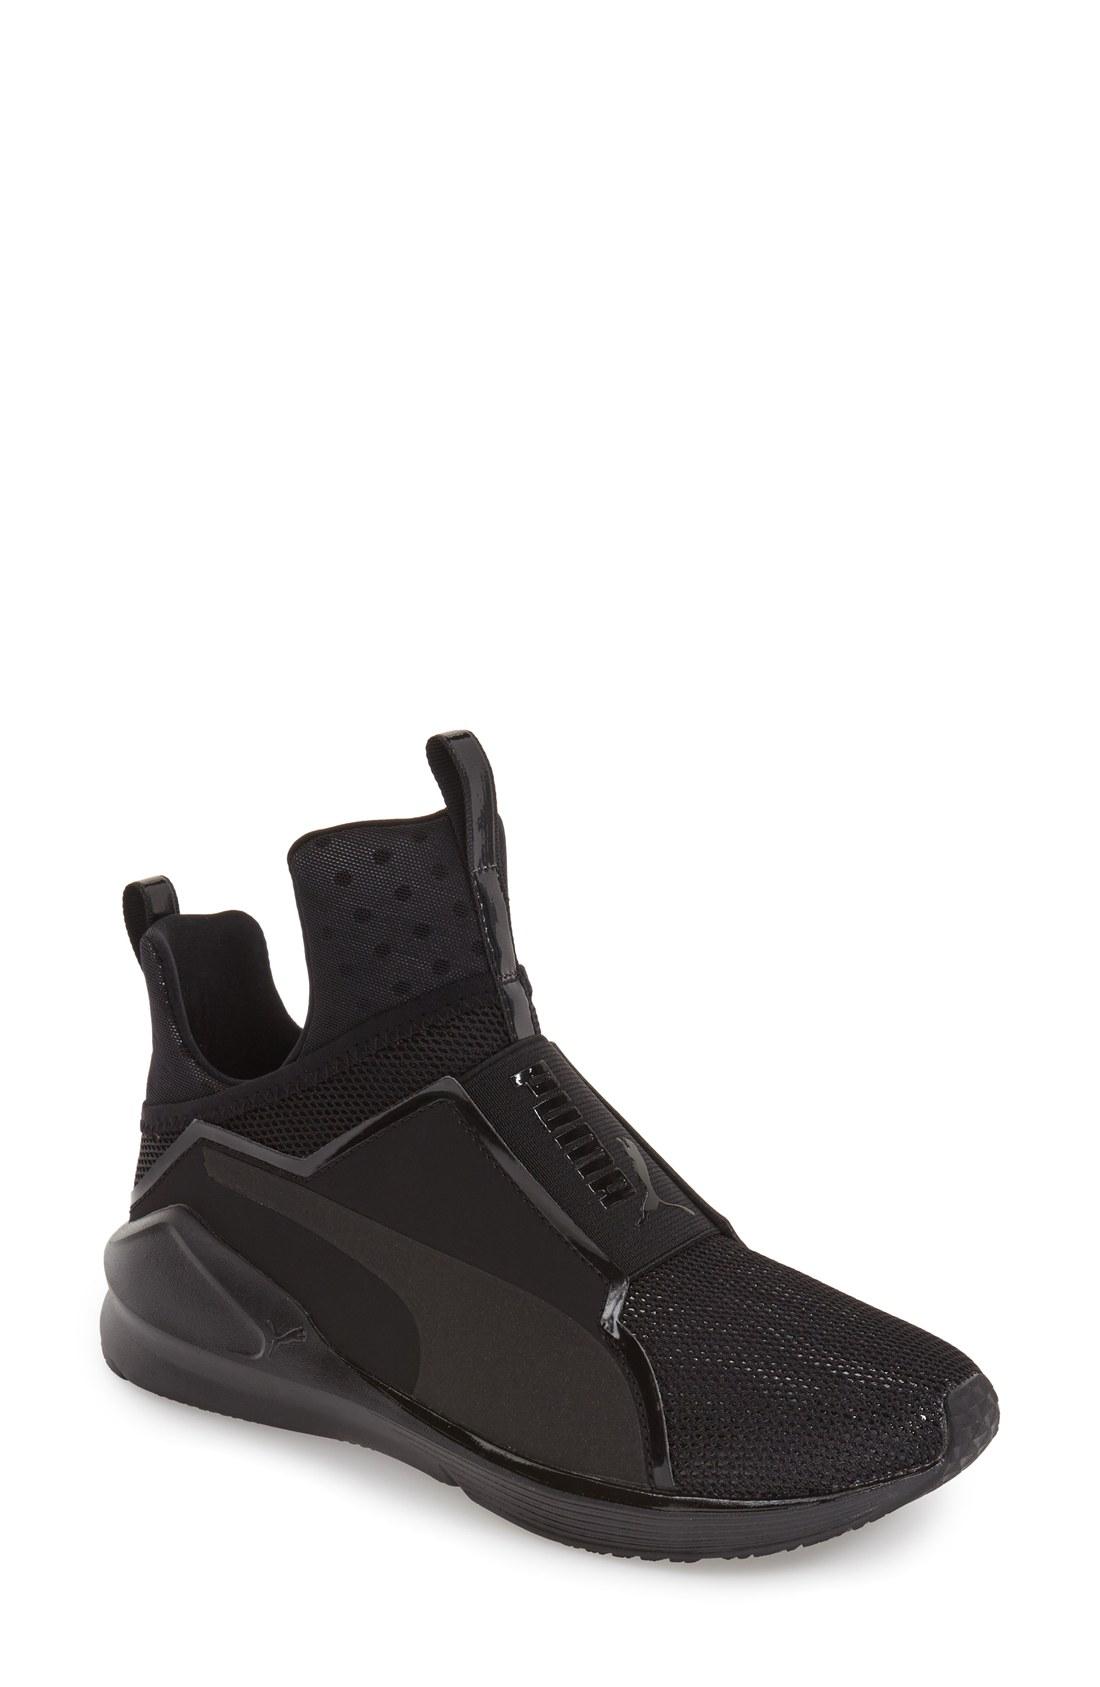 puma high tops fenty puma by rihanna u0027fierce shineu0027 high top sneaker (women) | nordstrom BWITUXS